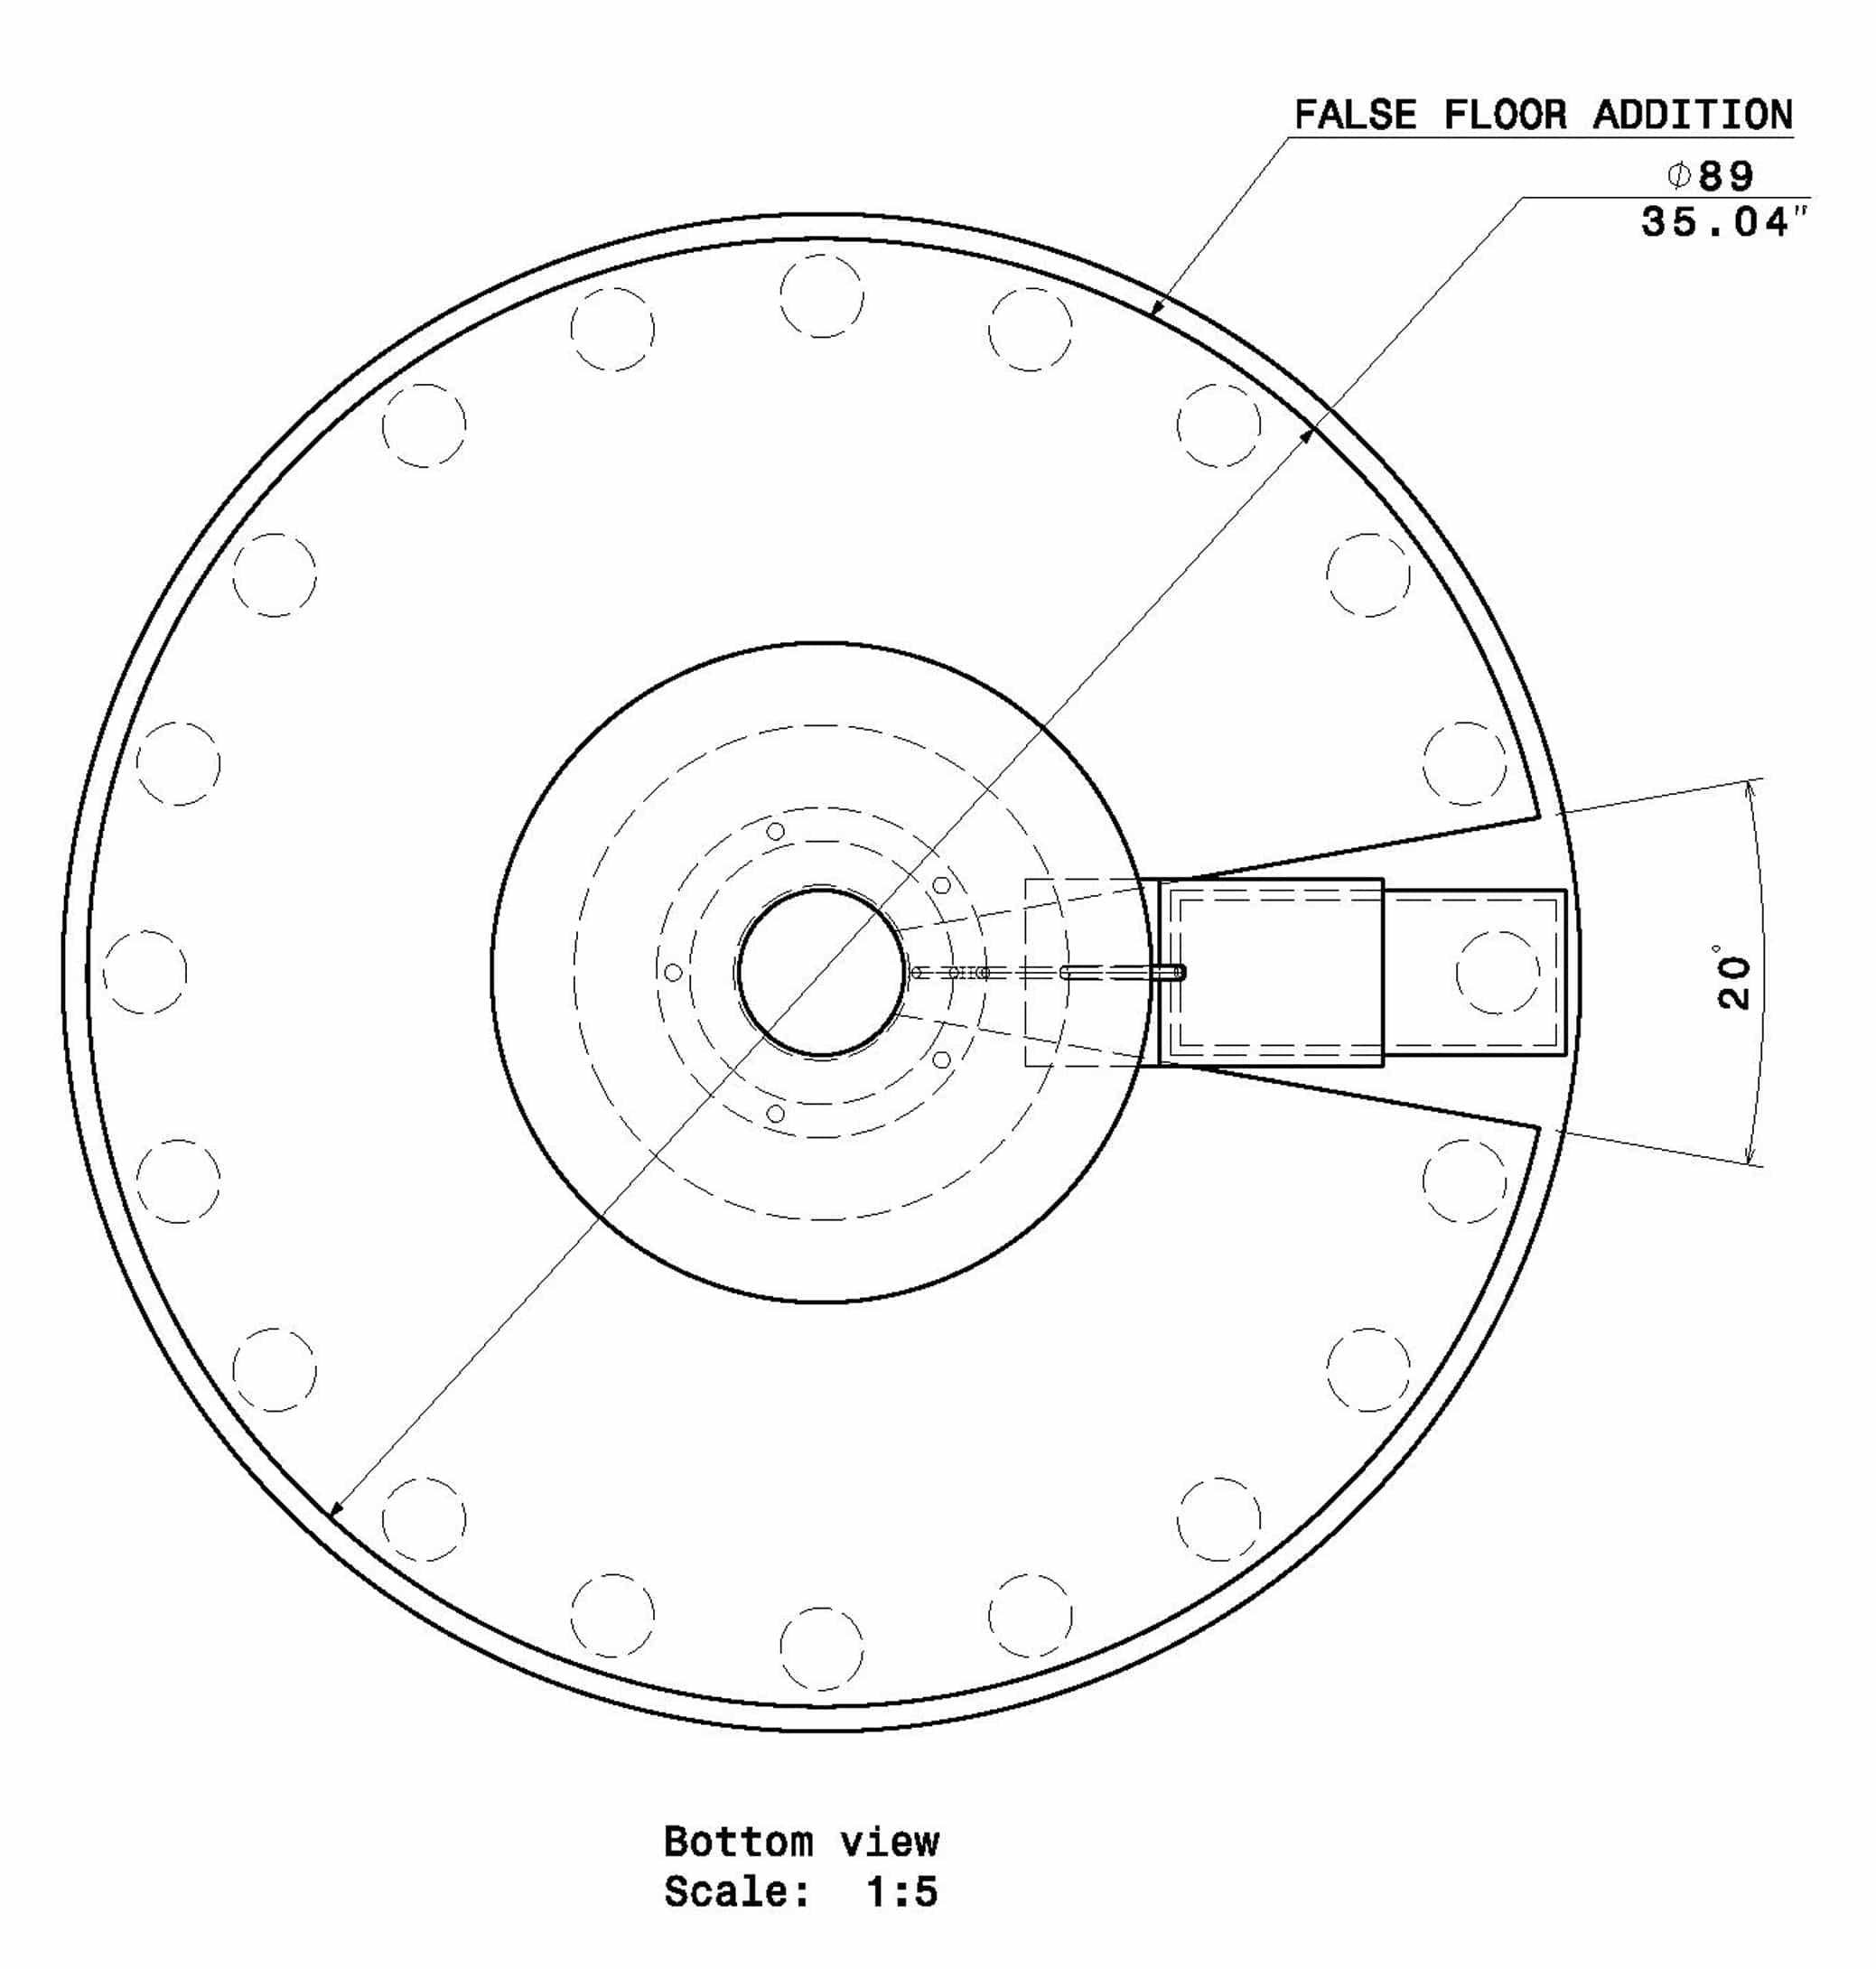 Barnes Maze - Mouse False Floor Addon - Image 2